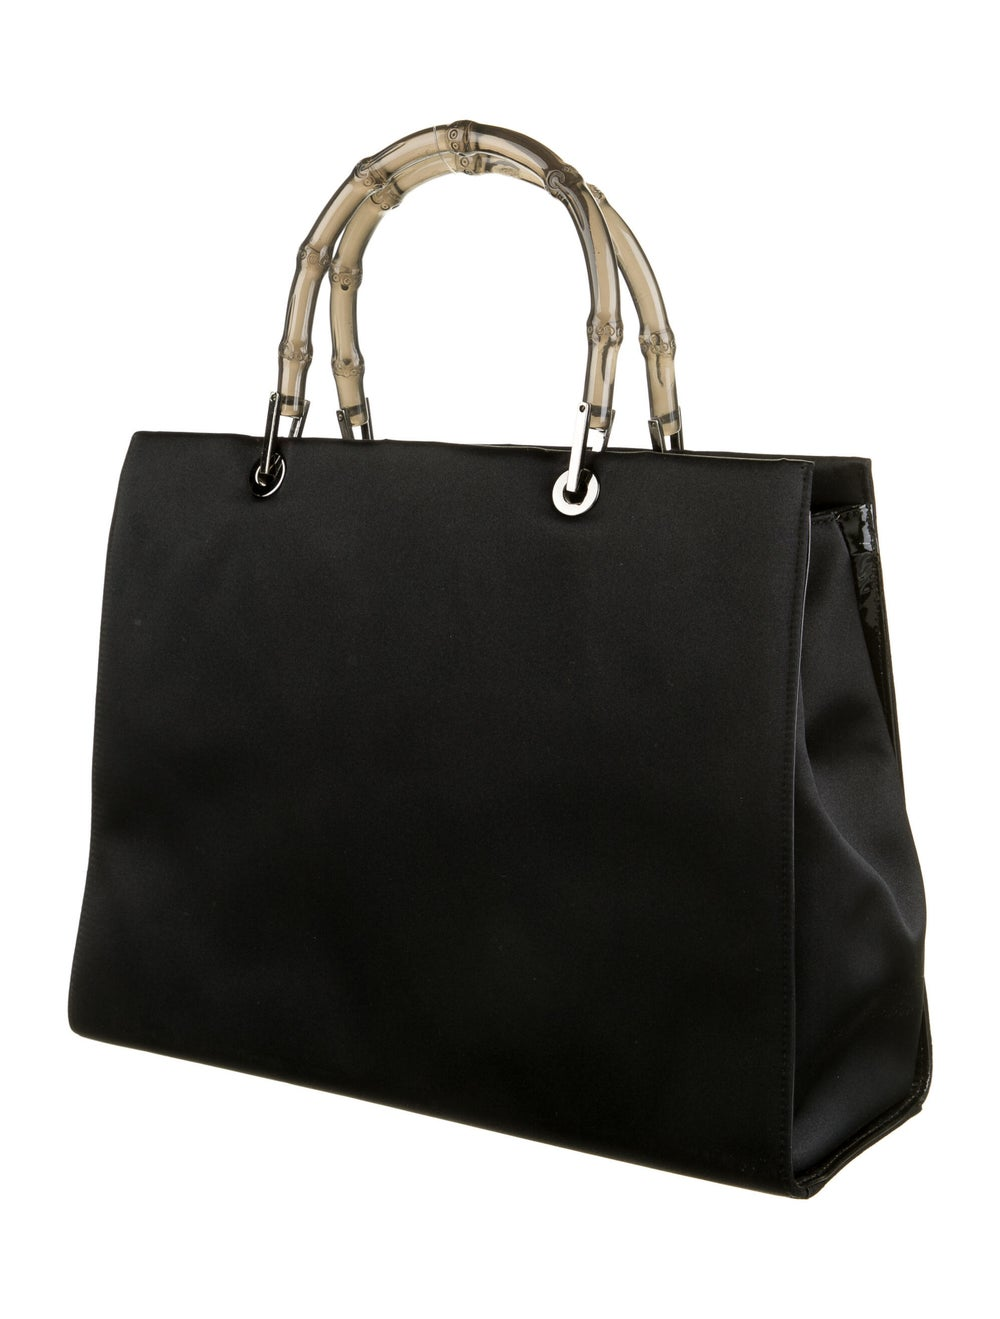 Gucci Clear Bamboo Satin Diana Handle Bag Black - image 3